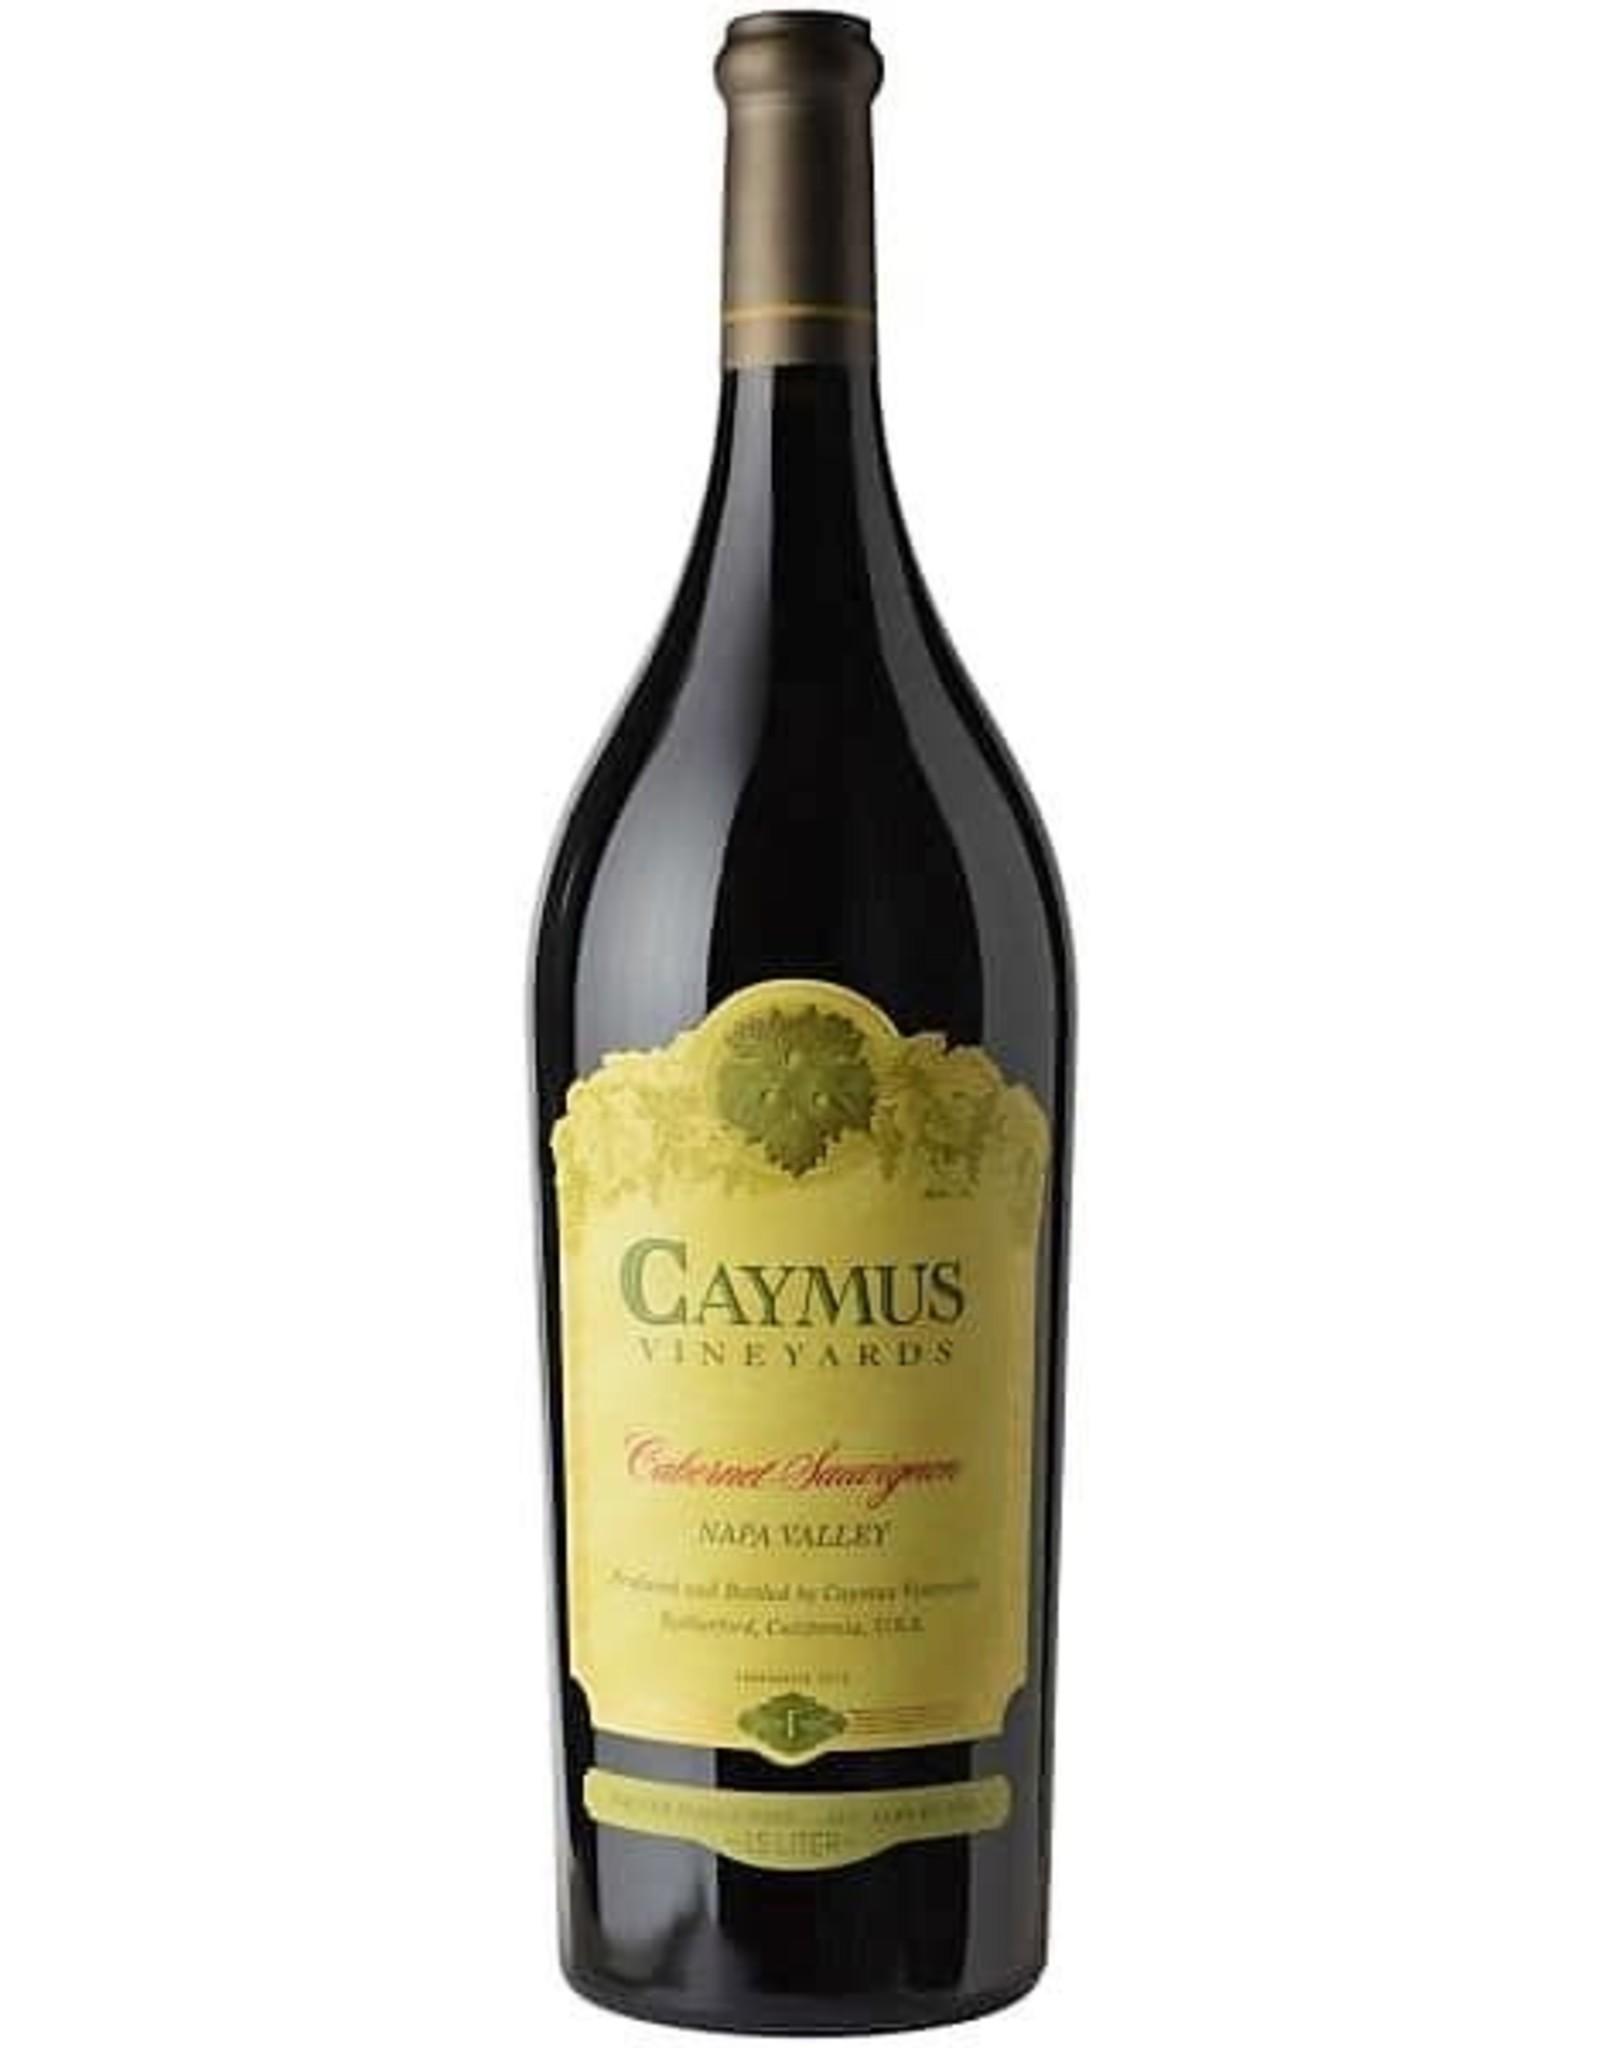 Caymus Cabernet Sauvignon 2019 liter